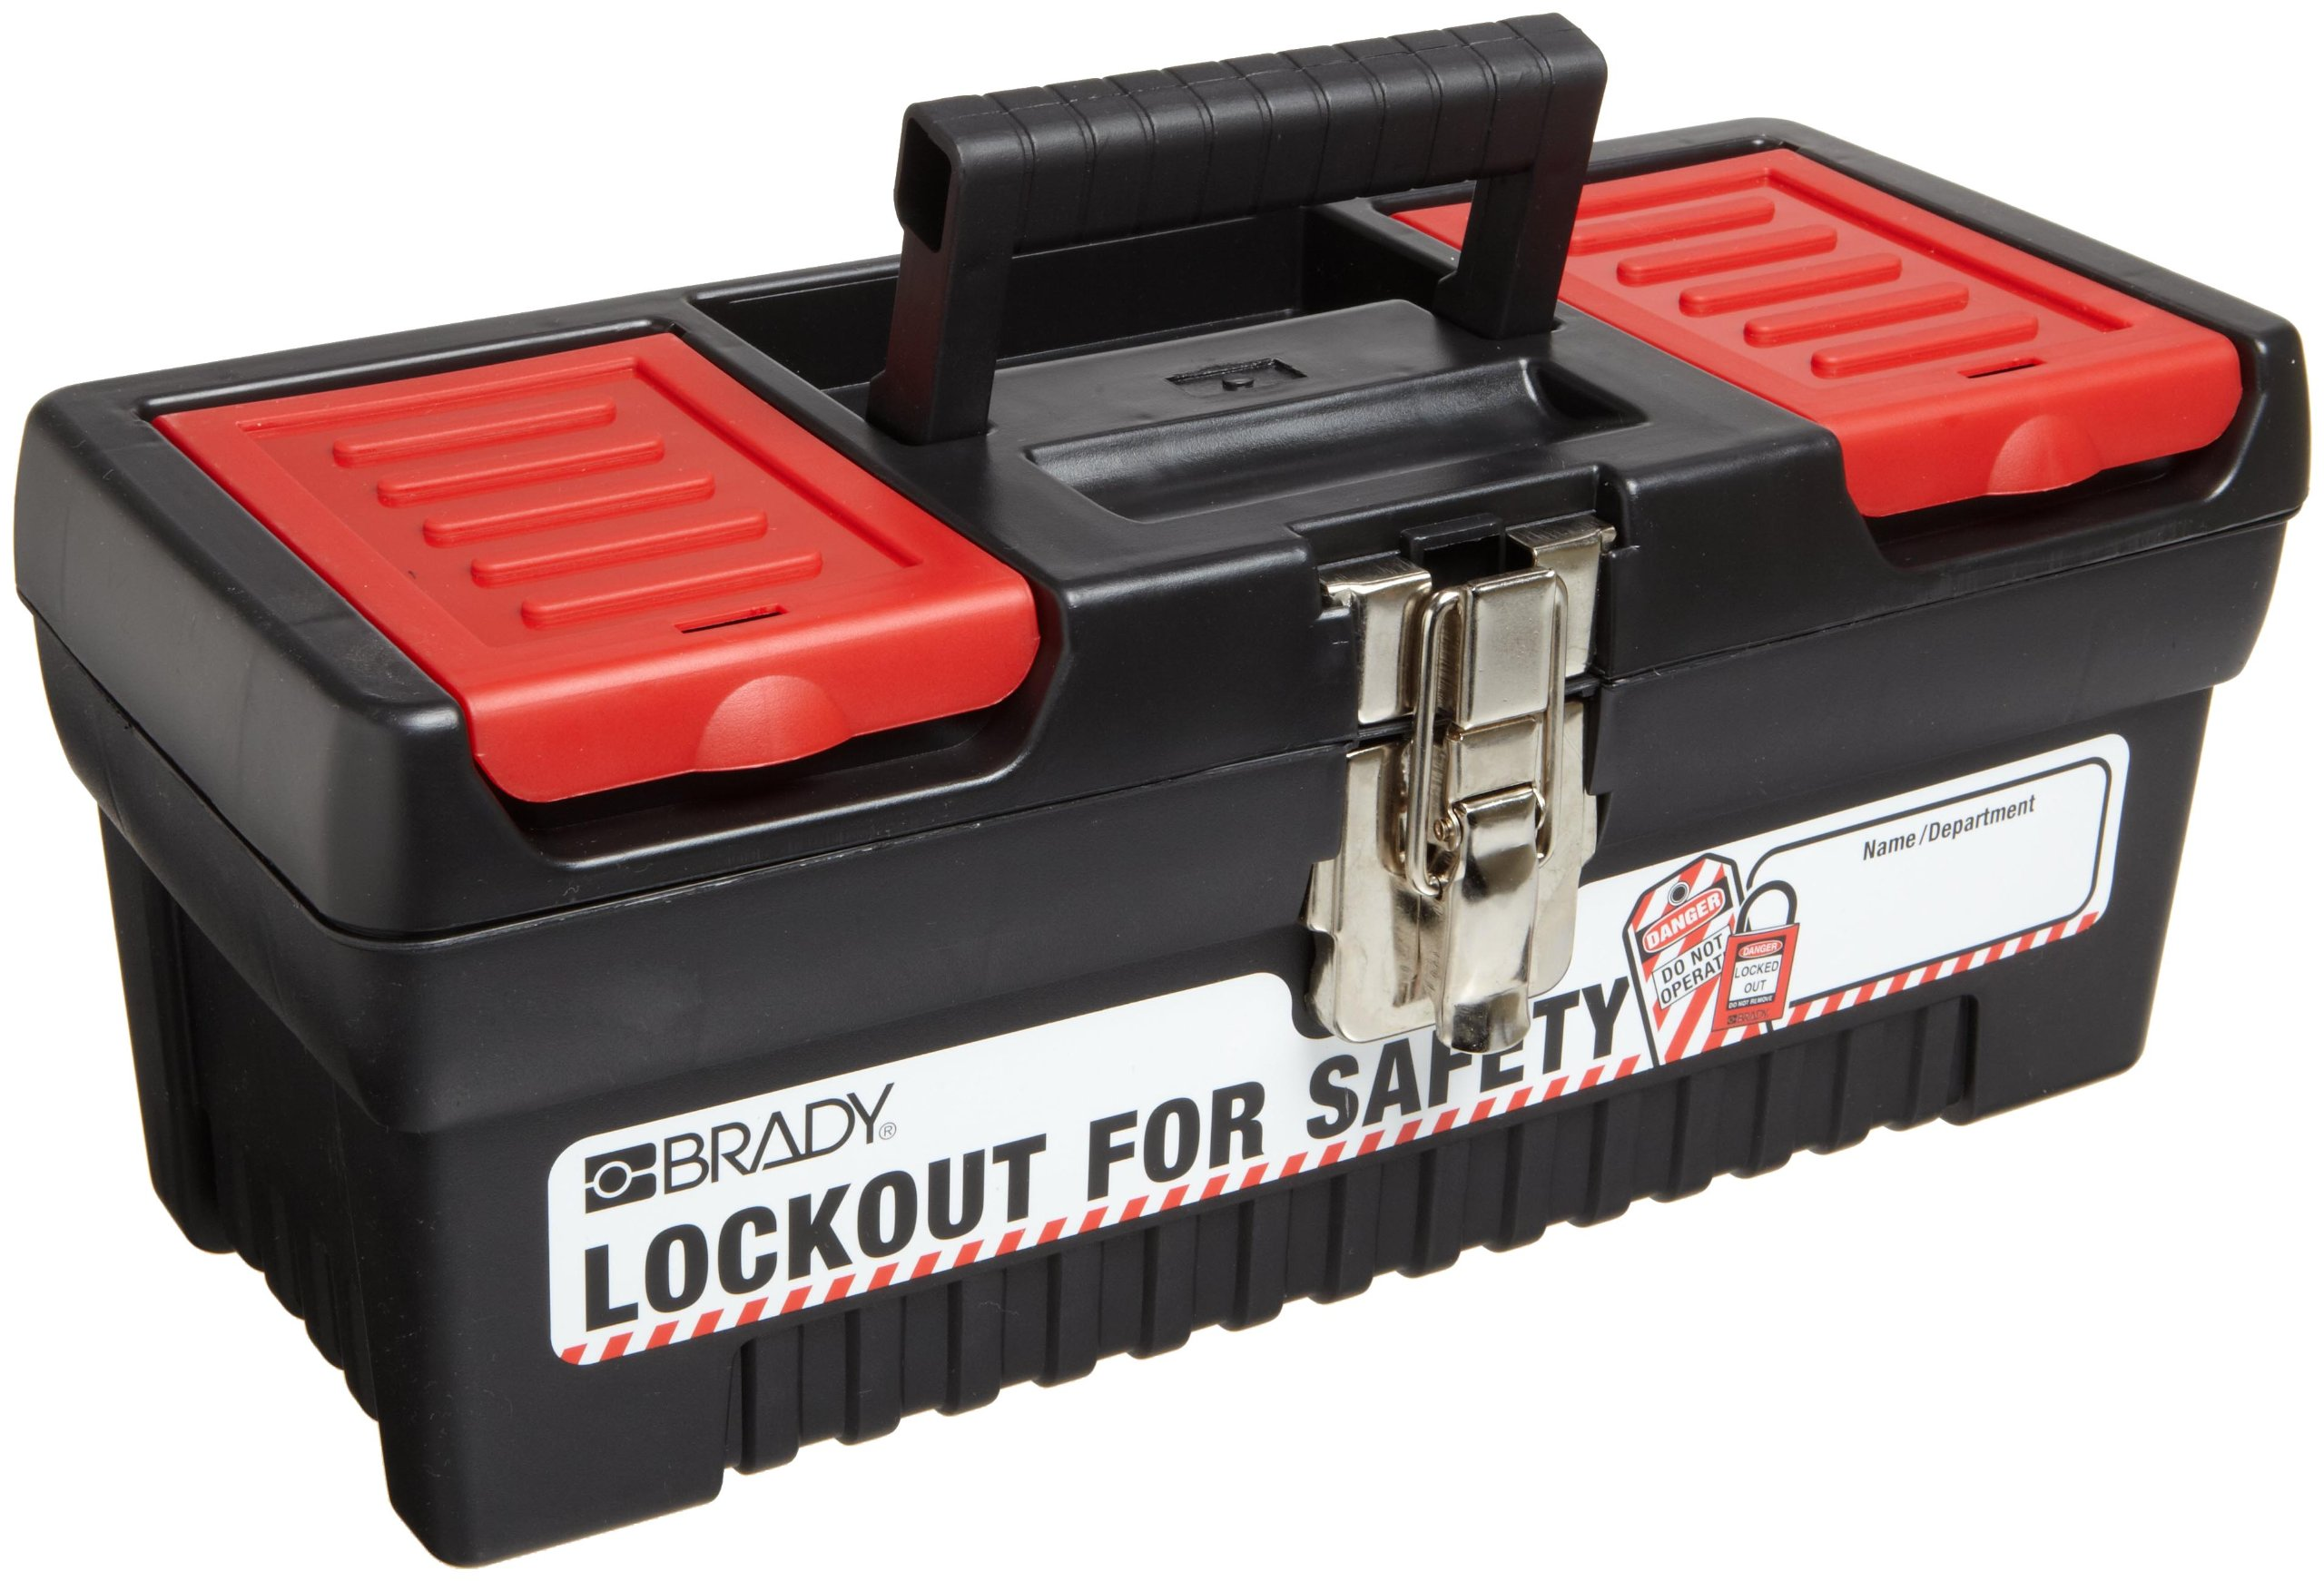 Brady Polypropylene Lockout Toolbox, Legend ''Lockout For Safety'', Small, 7.1'' Height, 14'' Width, 5.5'' Depth